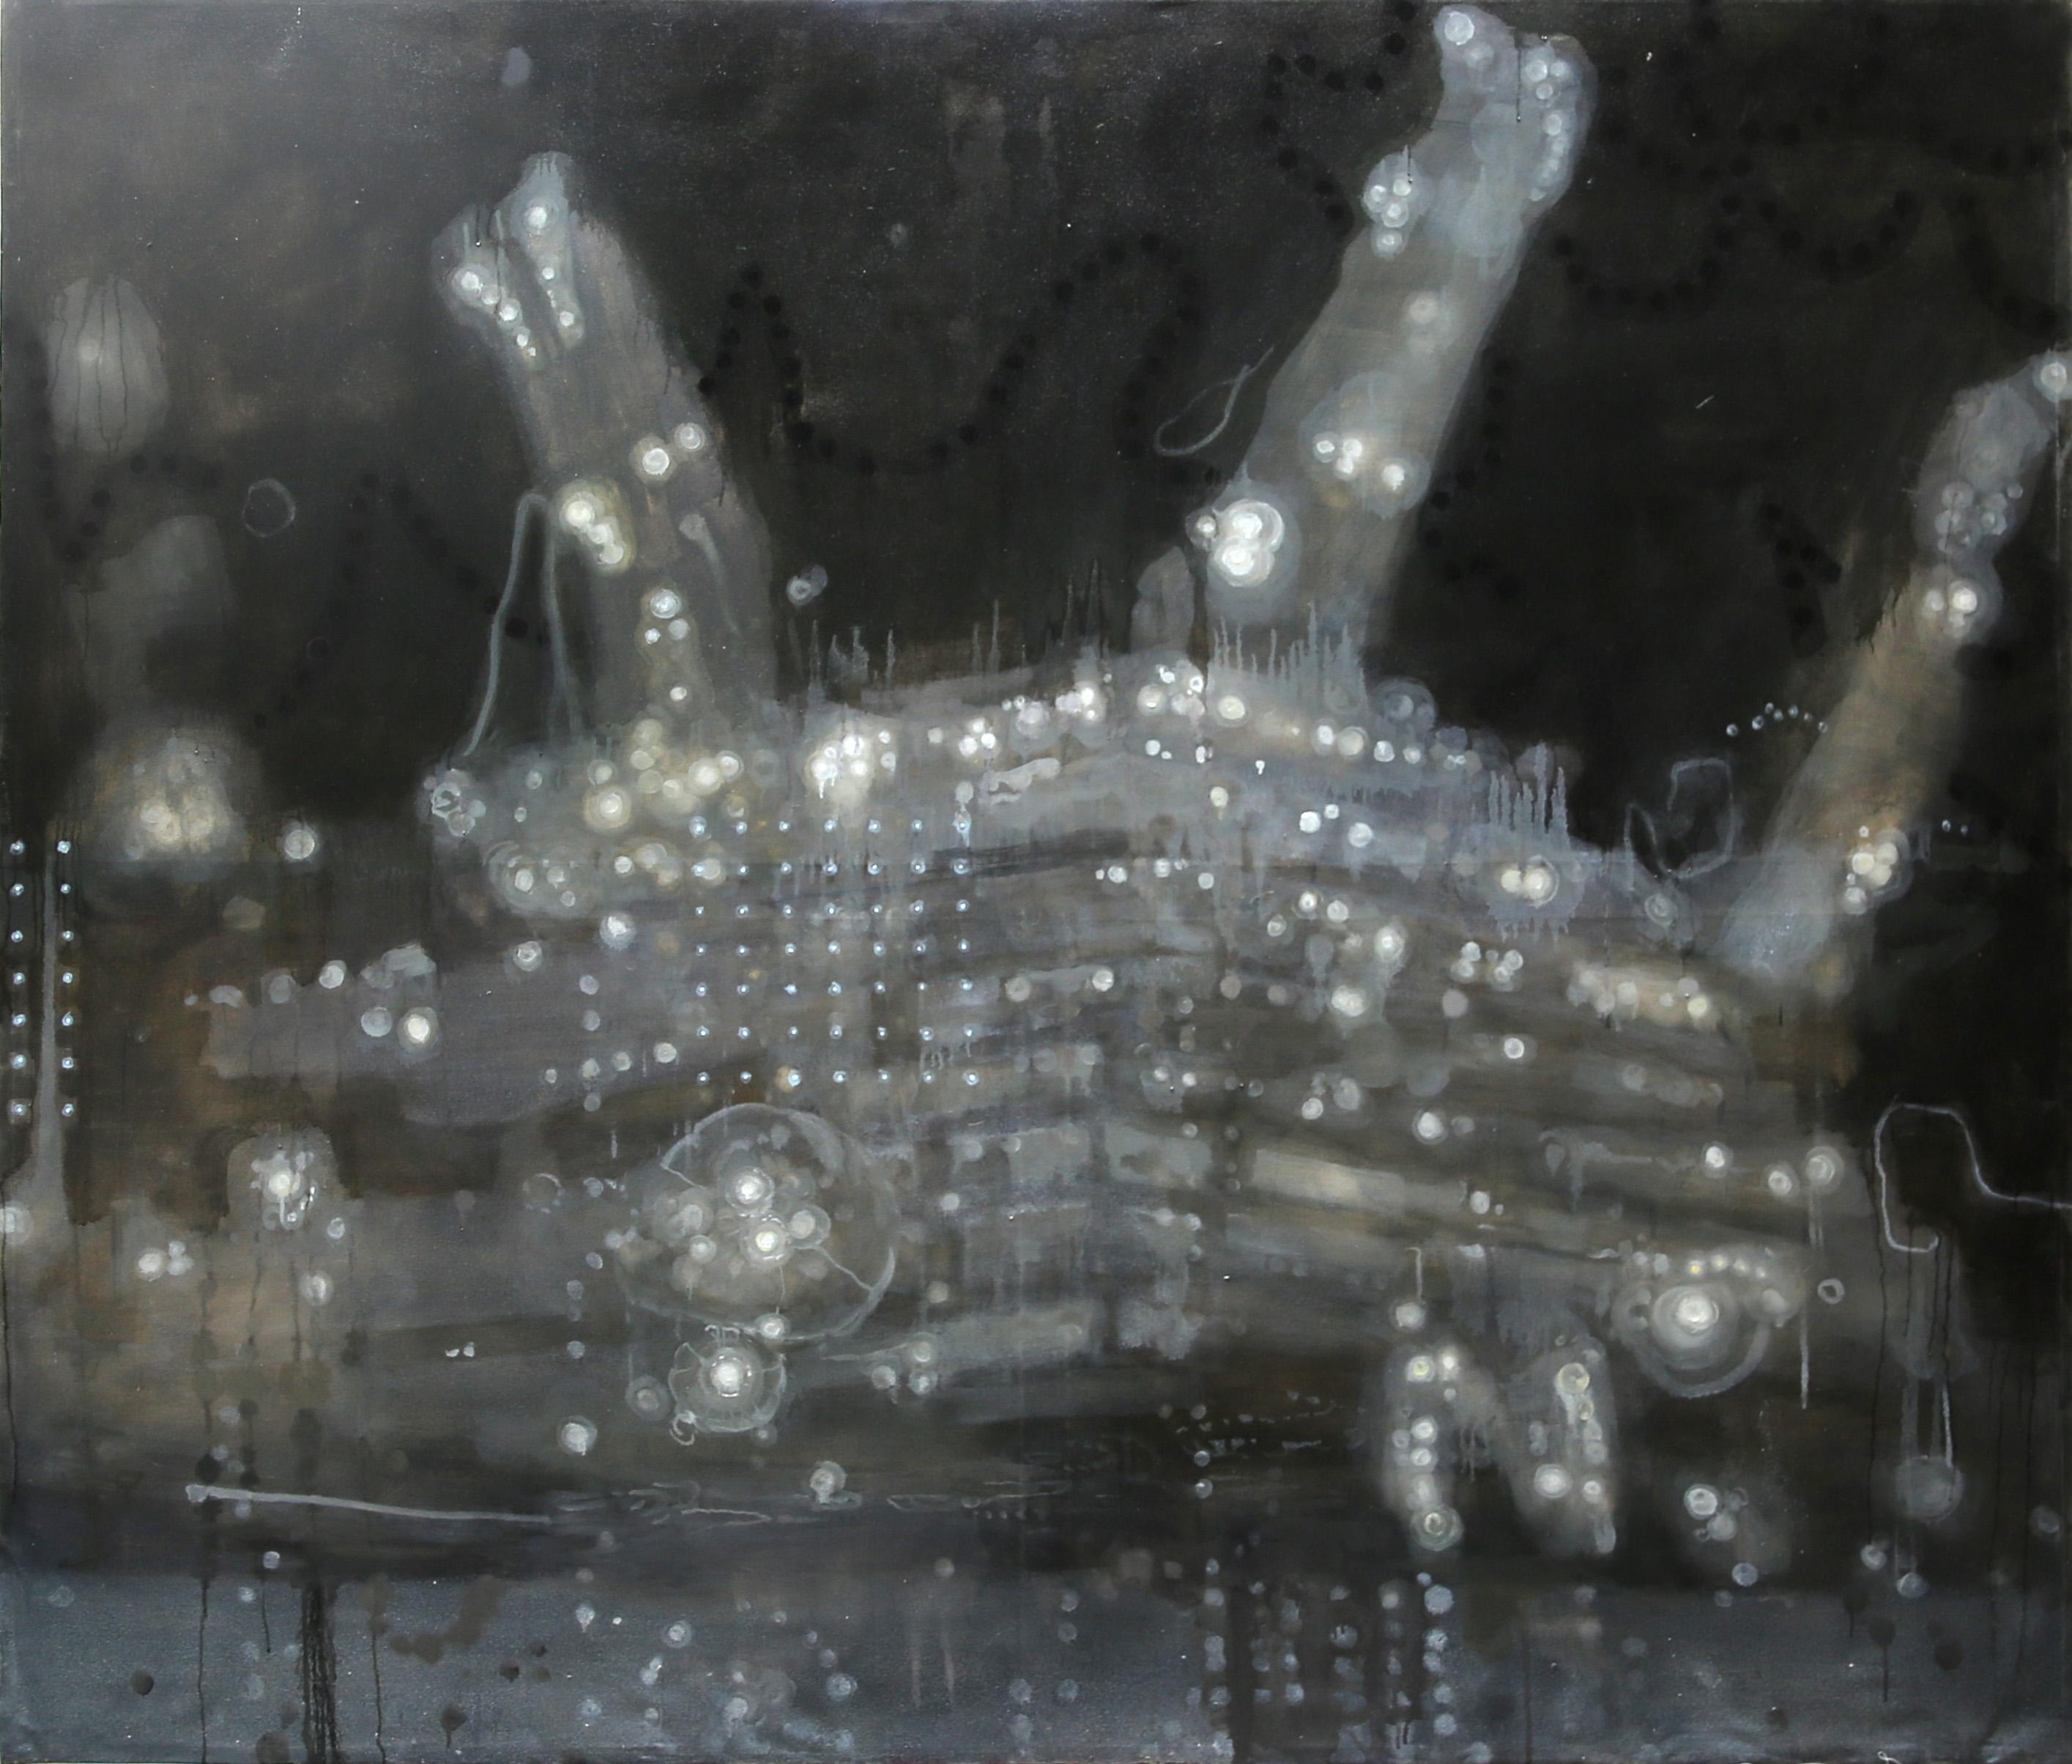 Jingge Dong: pittura, luce, tenebra e caos – Intervista